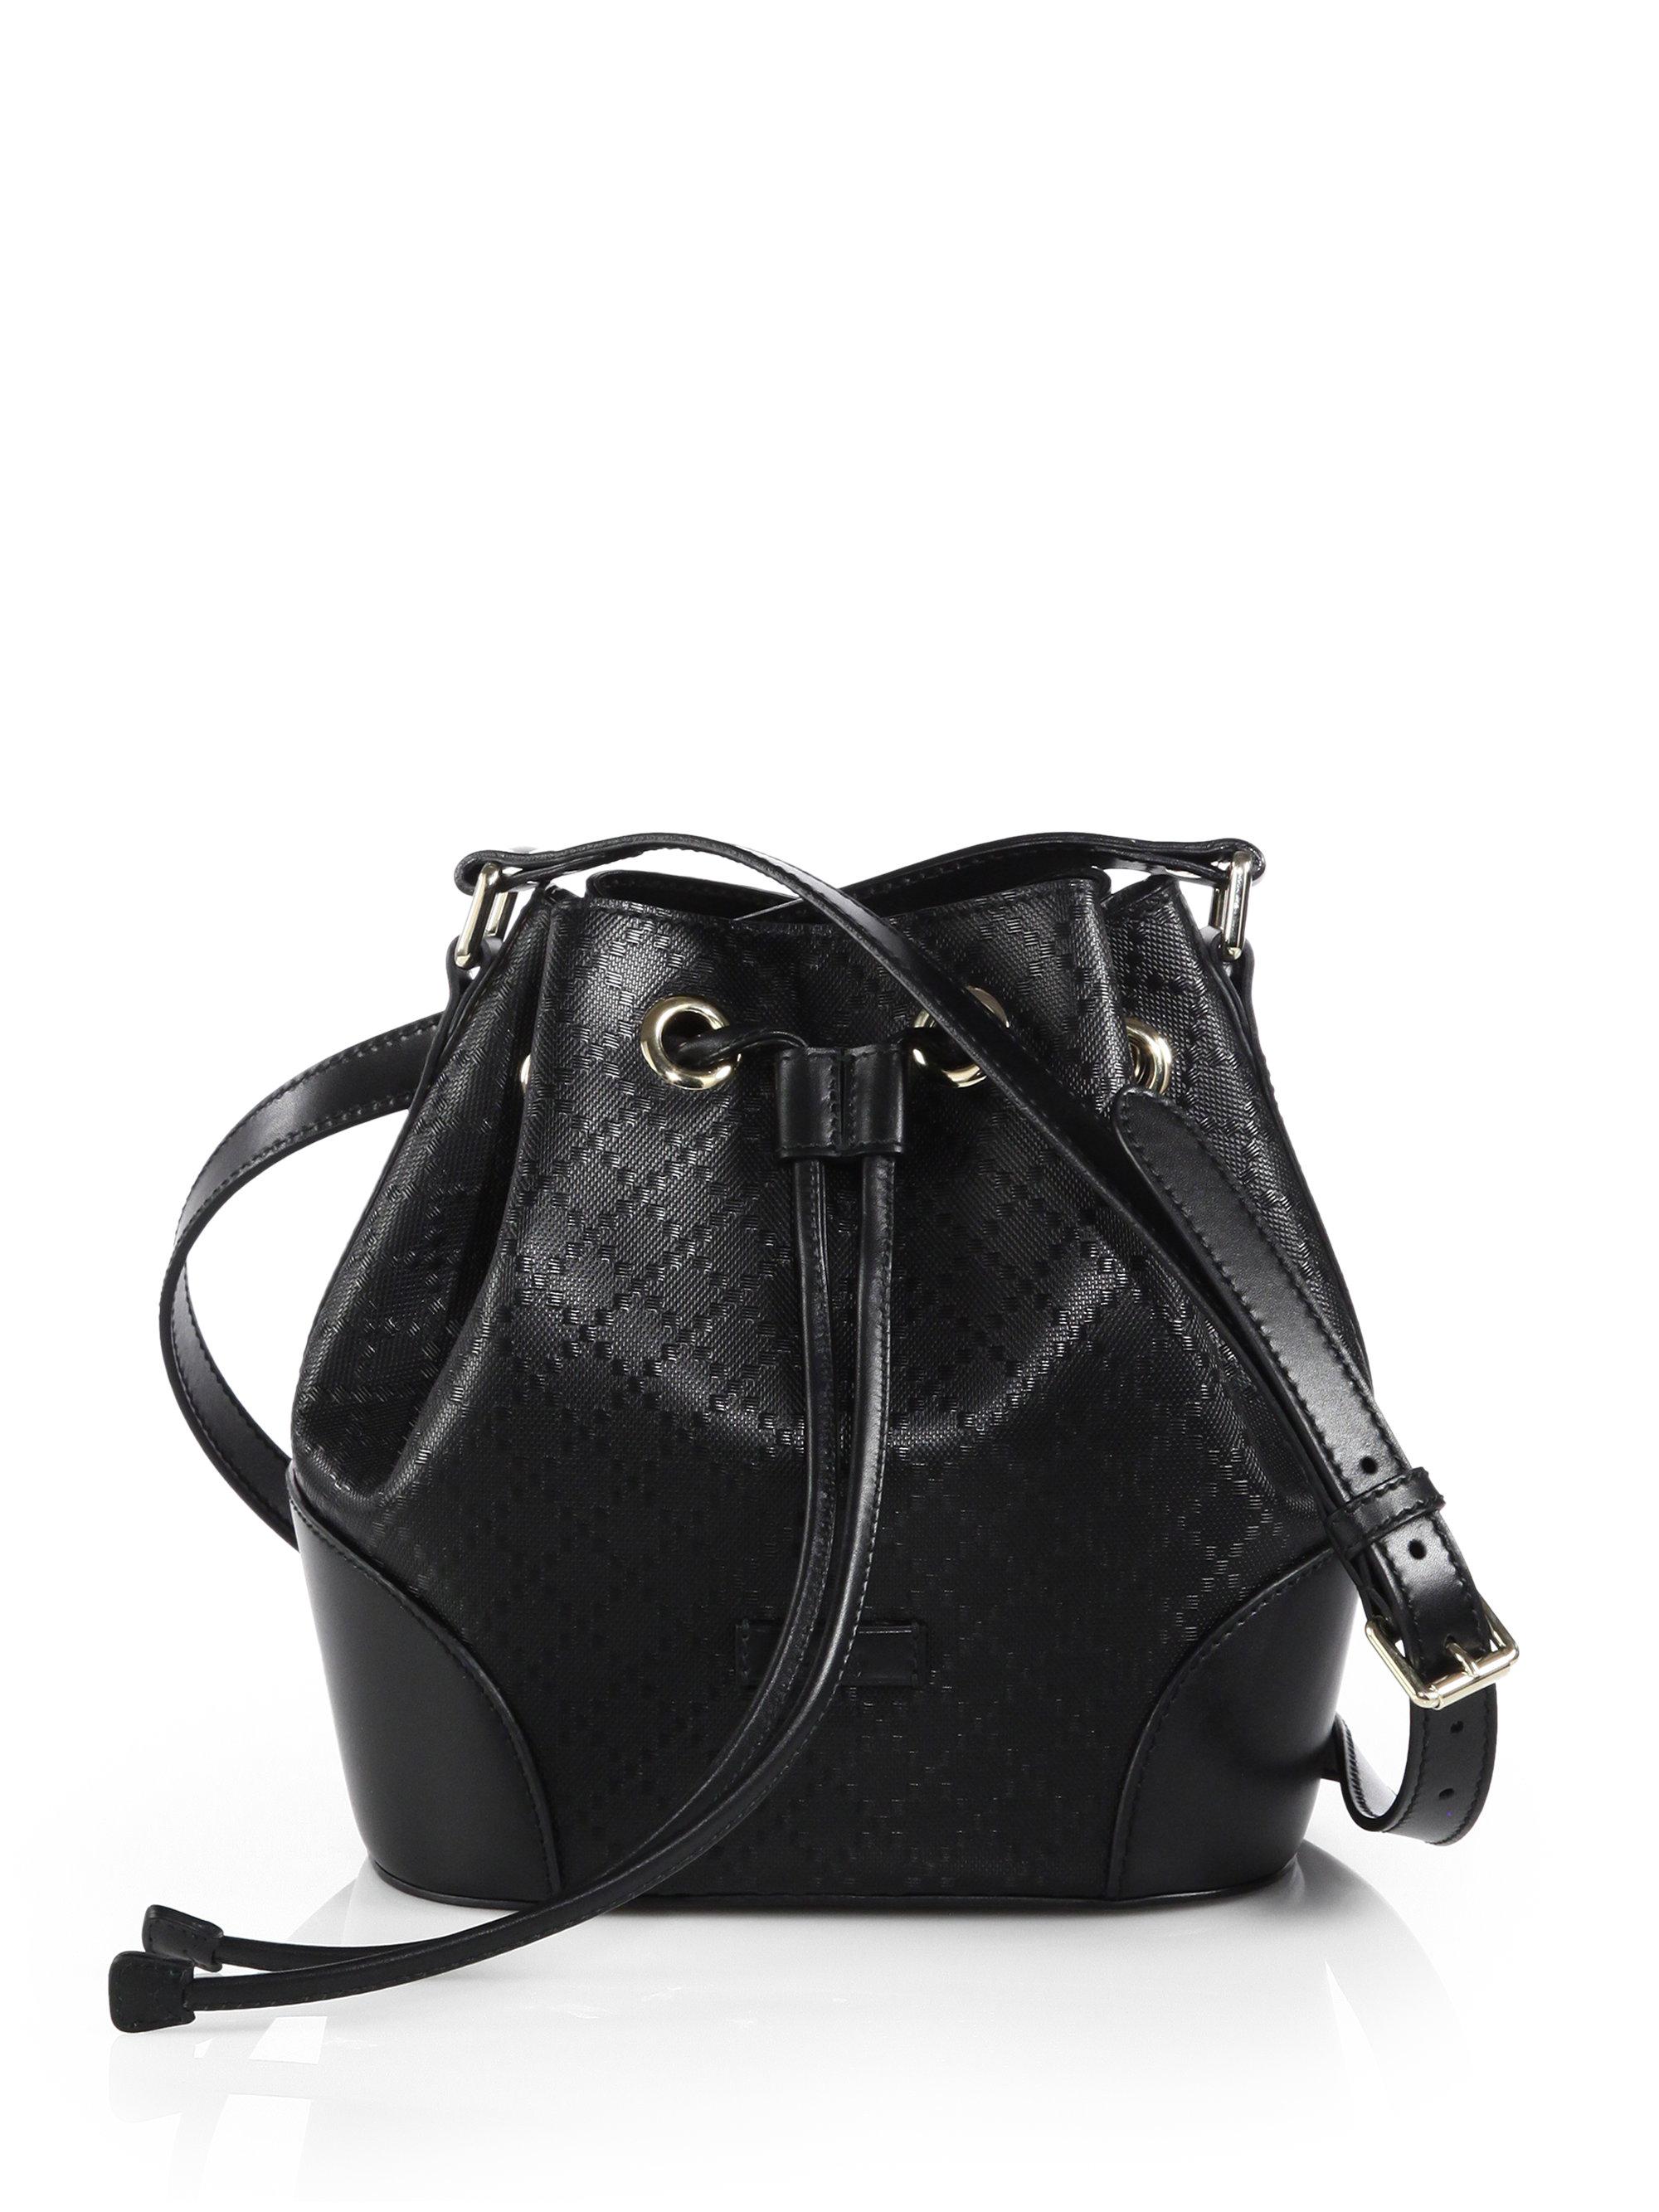 c0b687c00cb Lyst - Gucci Bright Diamante Leather Bucket Bag in Black